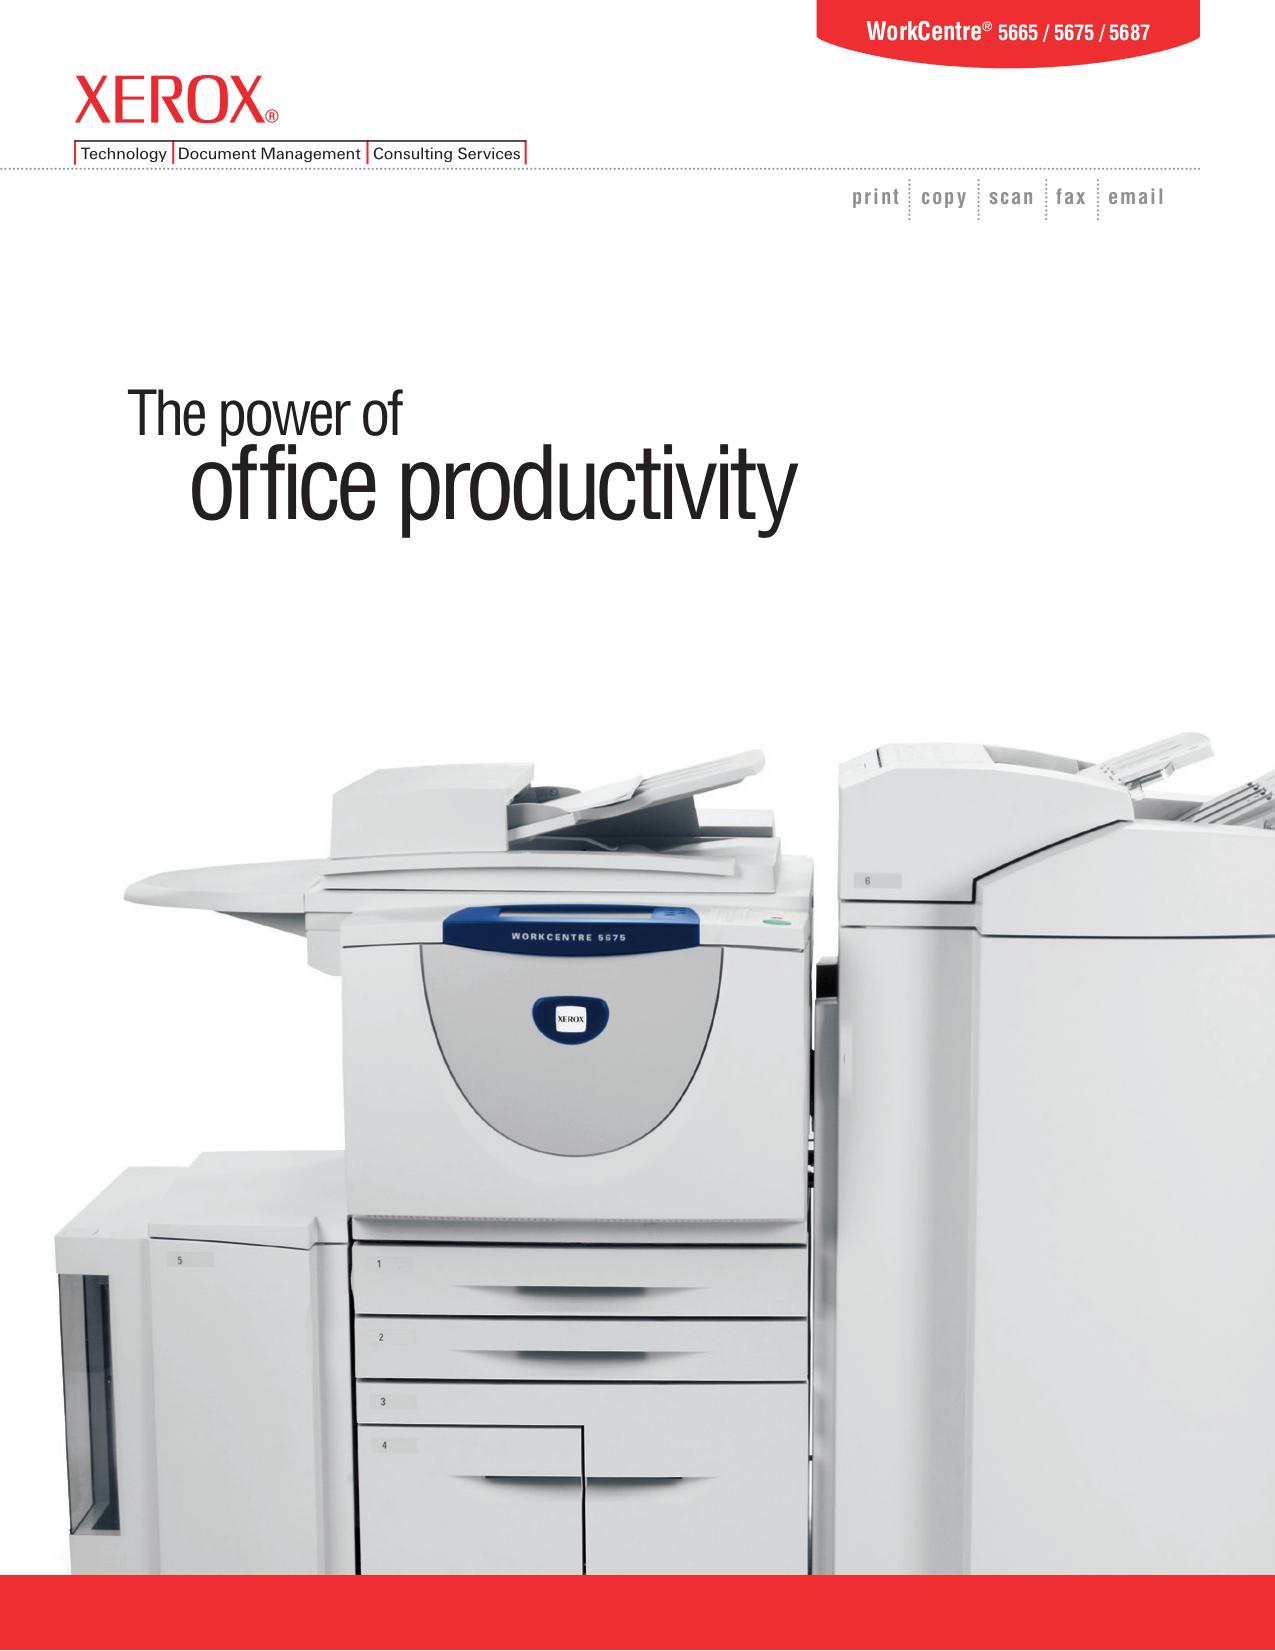 download free pdf for xerox workcentre 5665 multifunction printer manual rh umlib com xerox wc 5675 service manual Xerox WorkCentre 7845